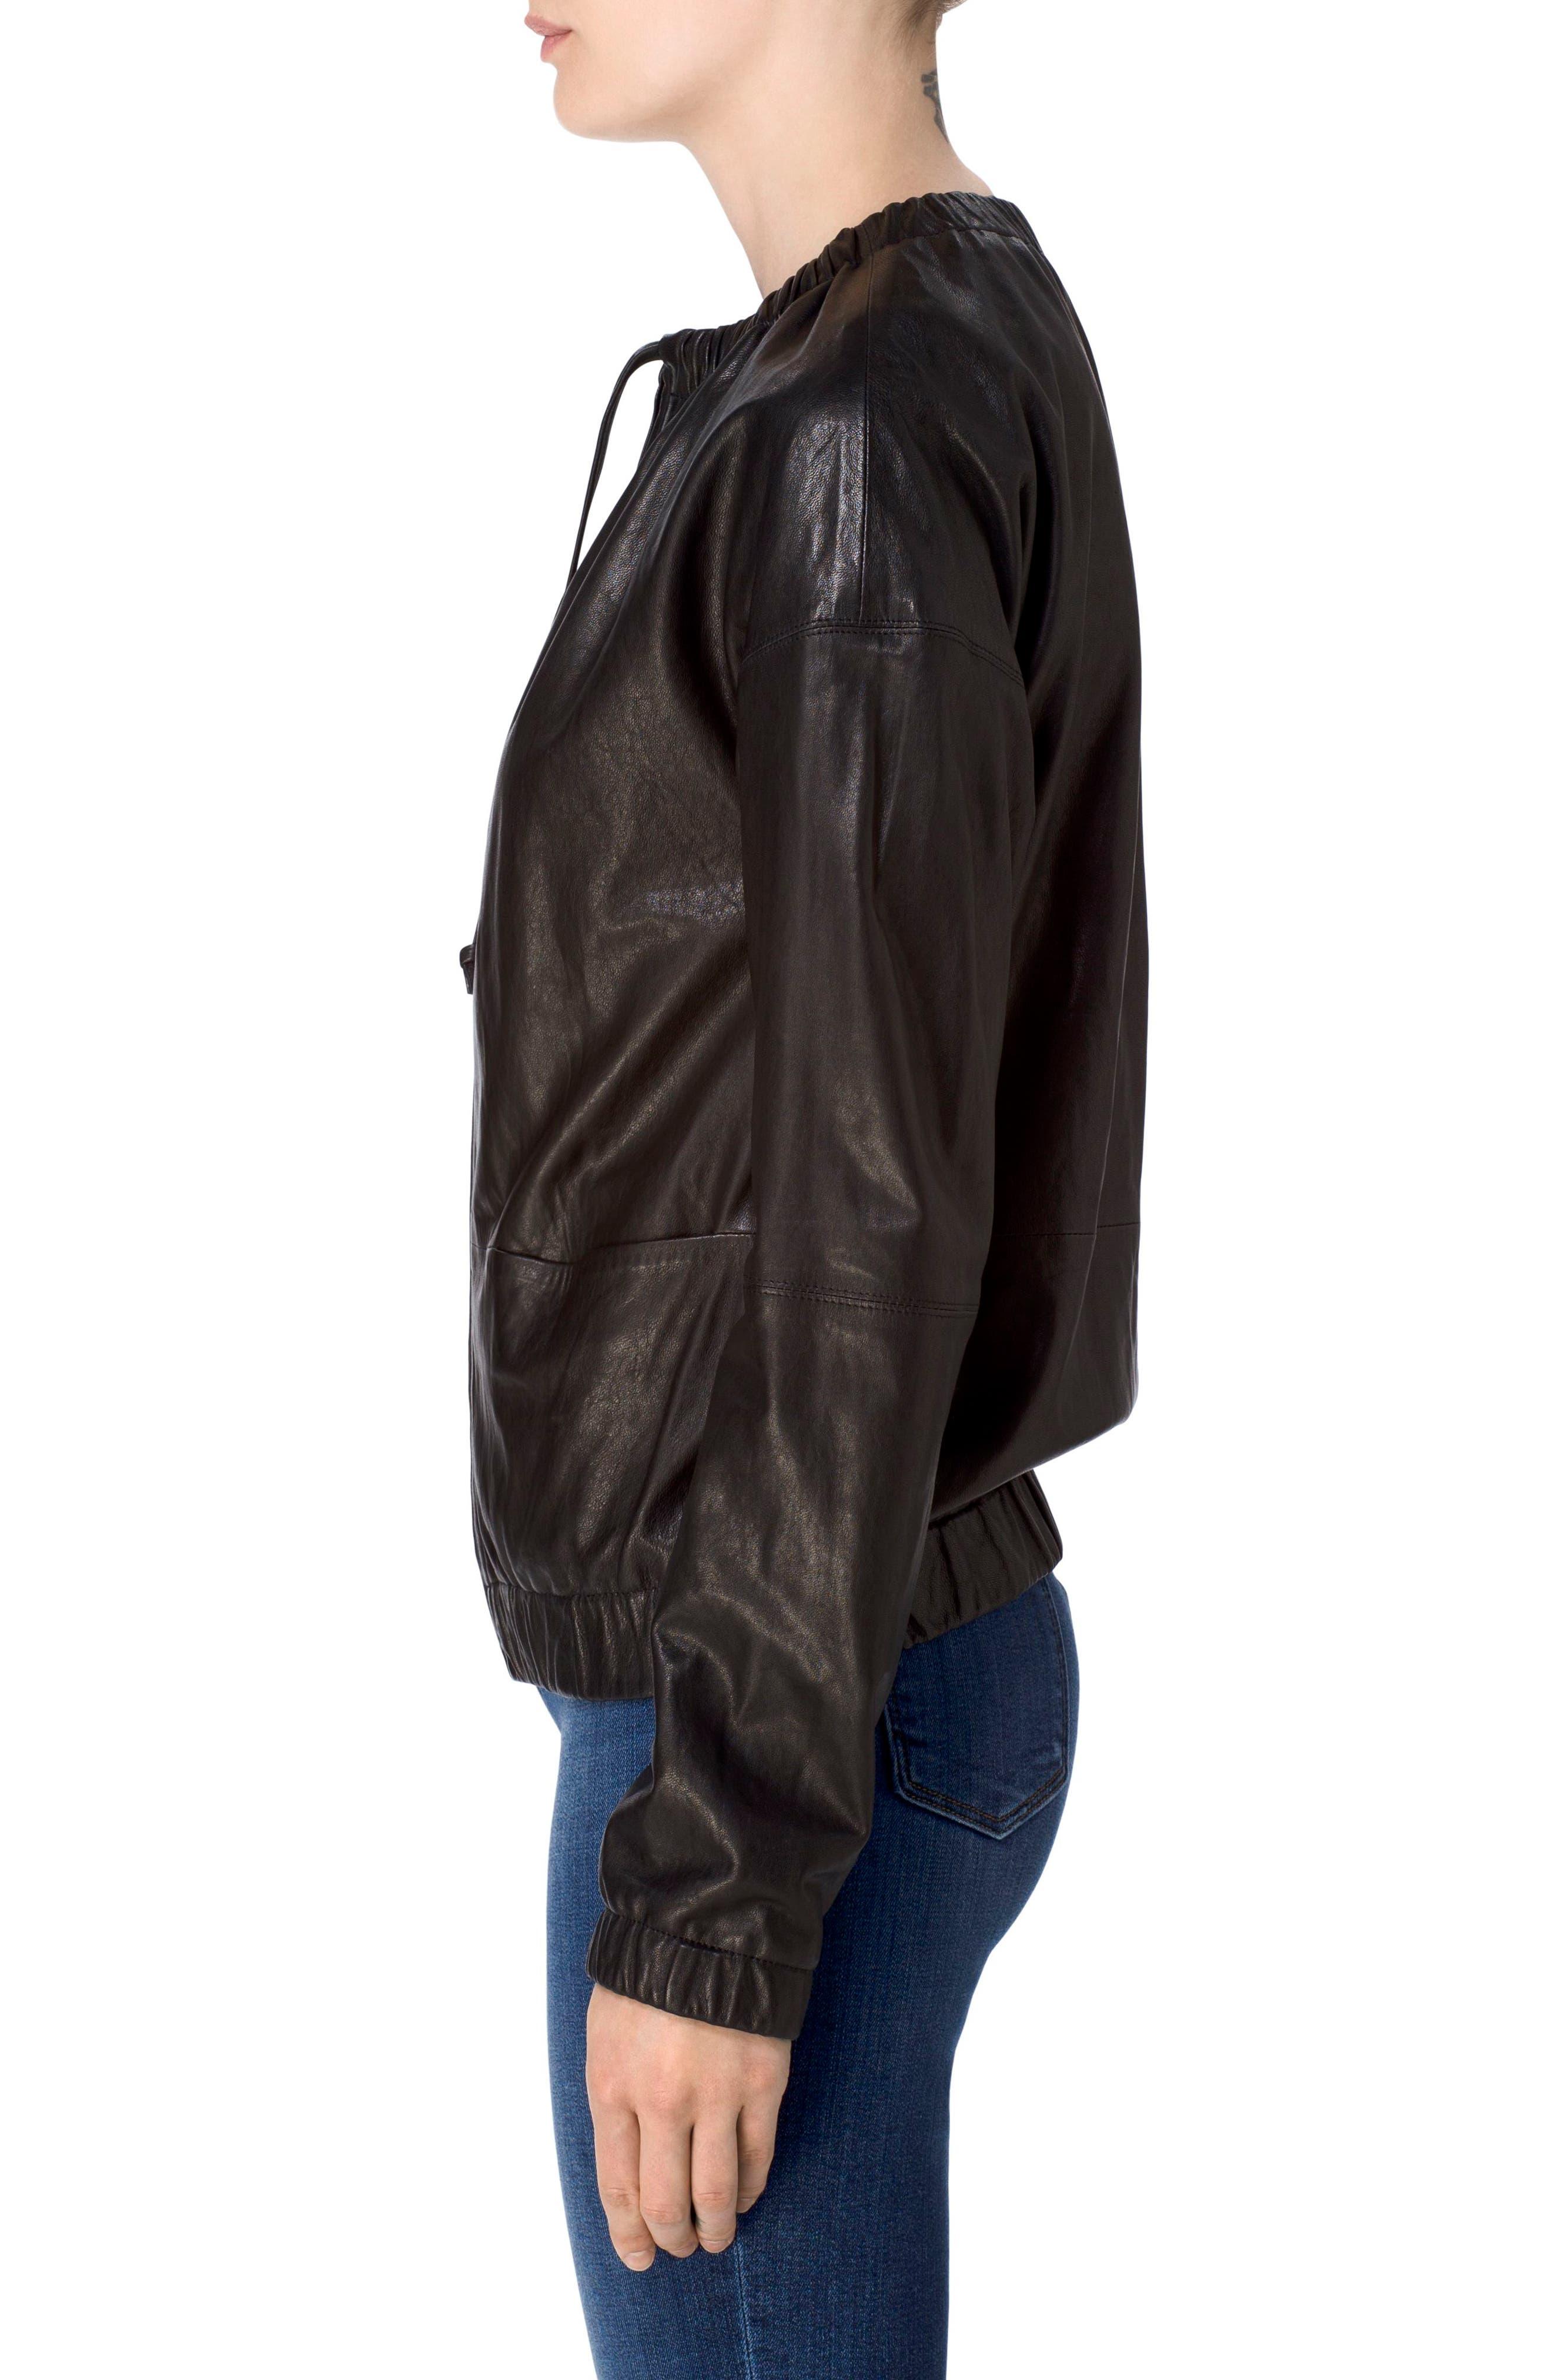 Baez Leather Bomber Jacket,                             Alternate thumbnail 4, color,                             001